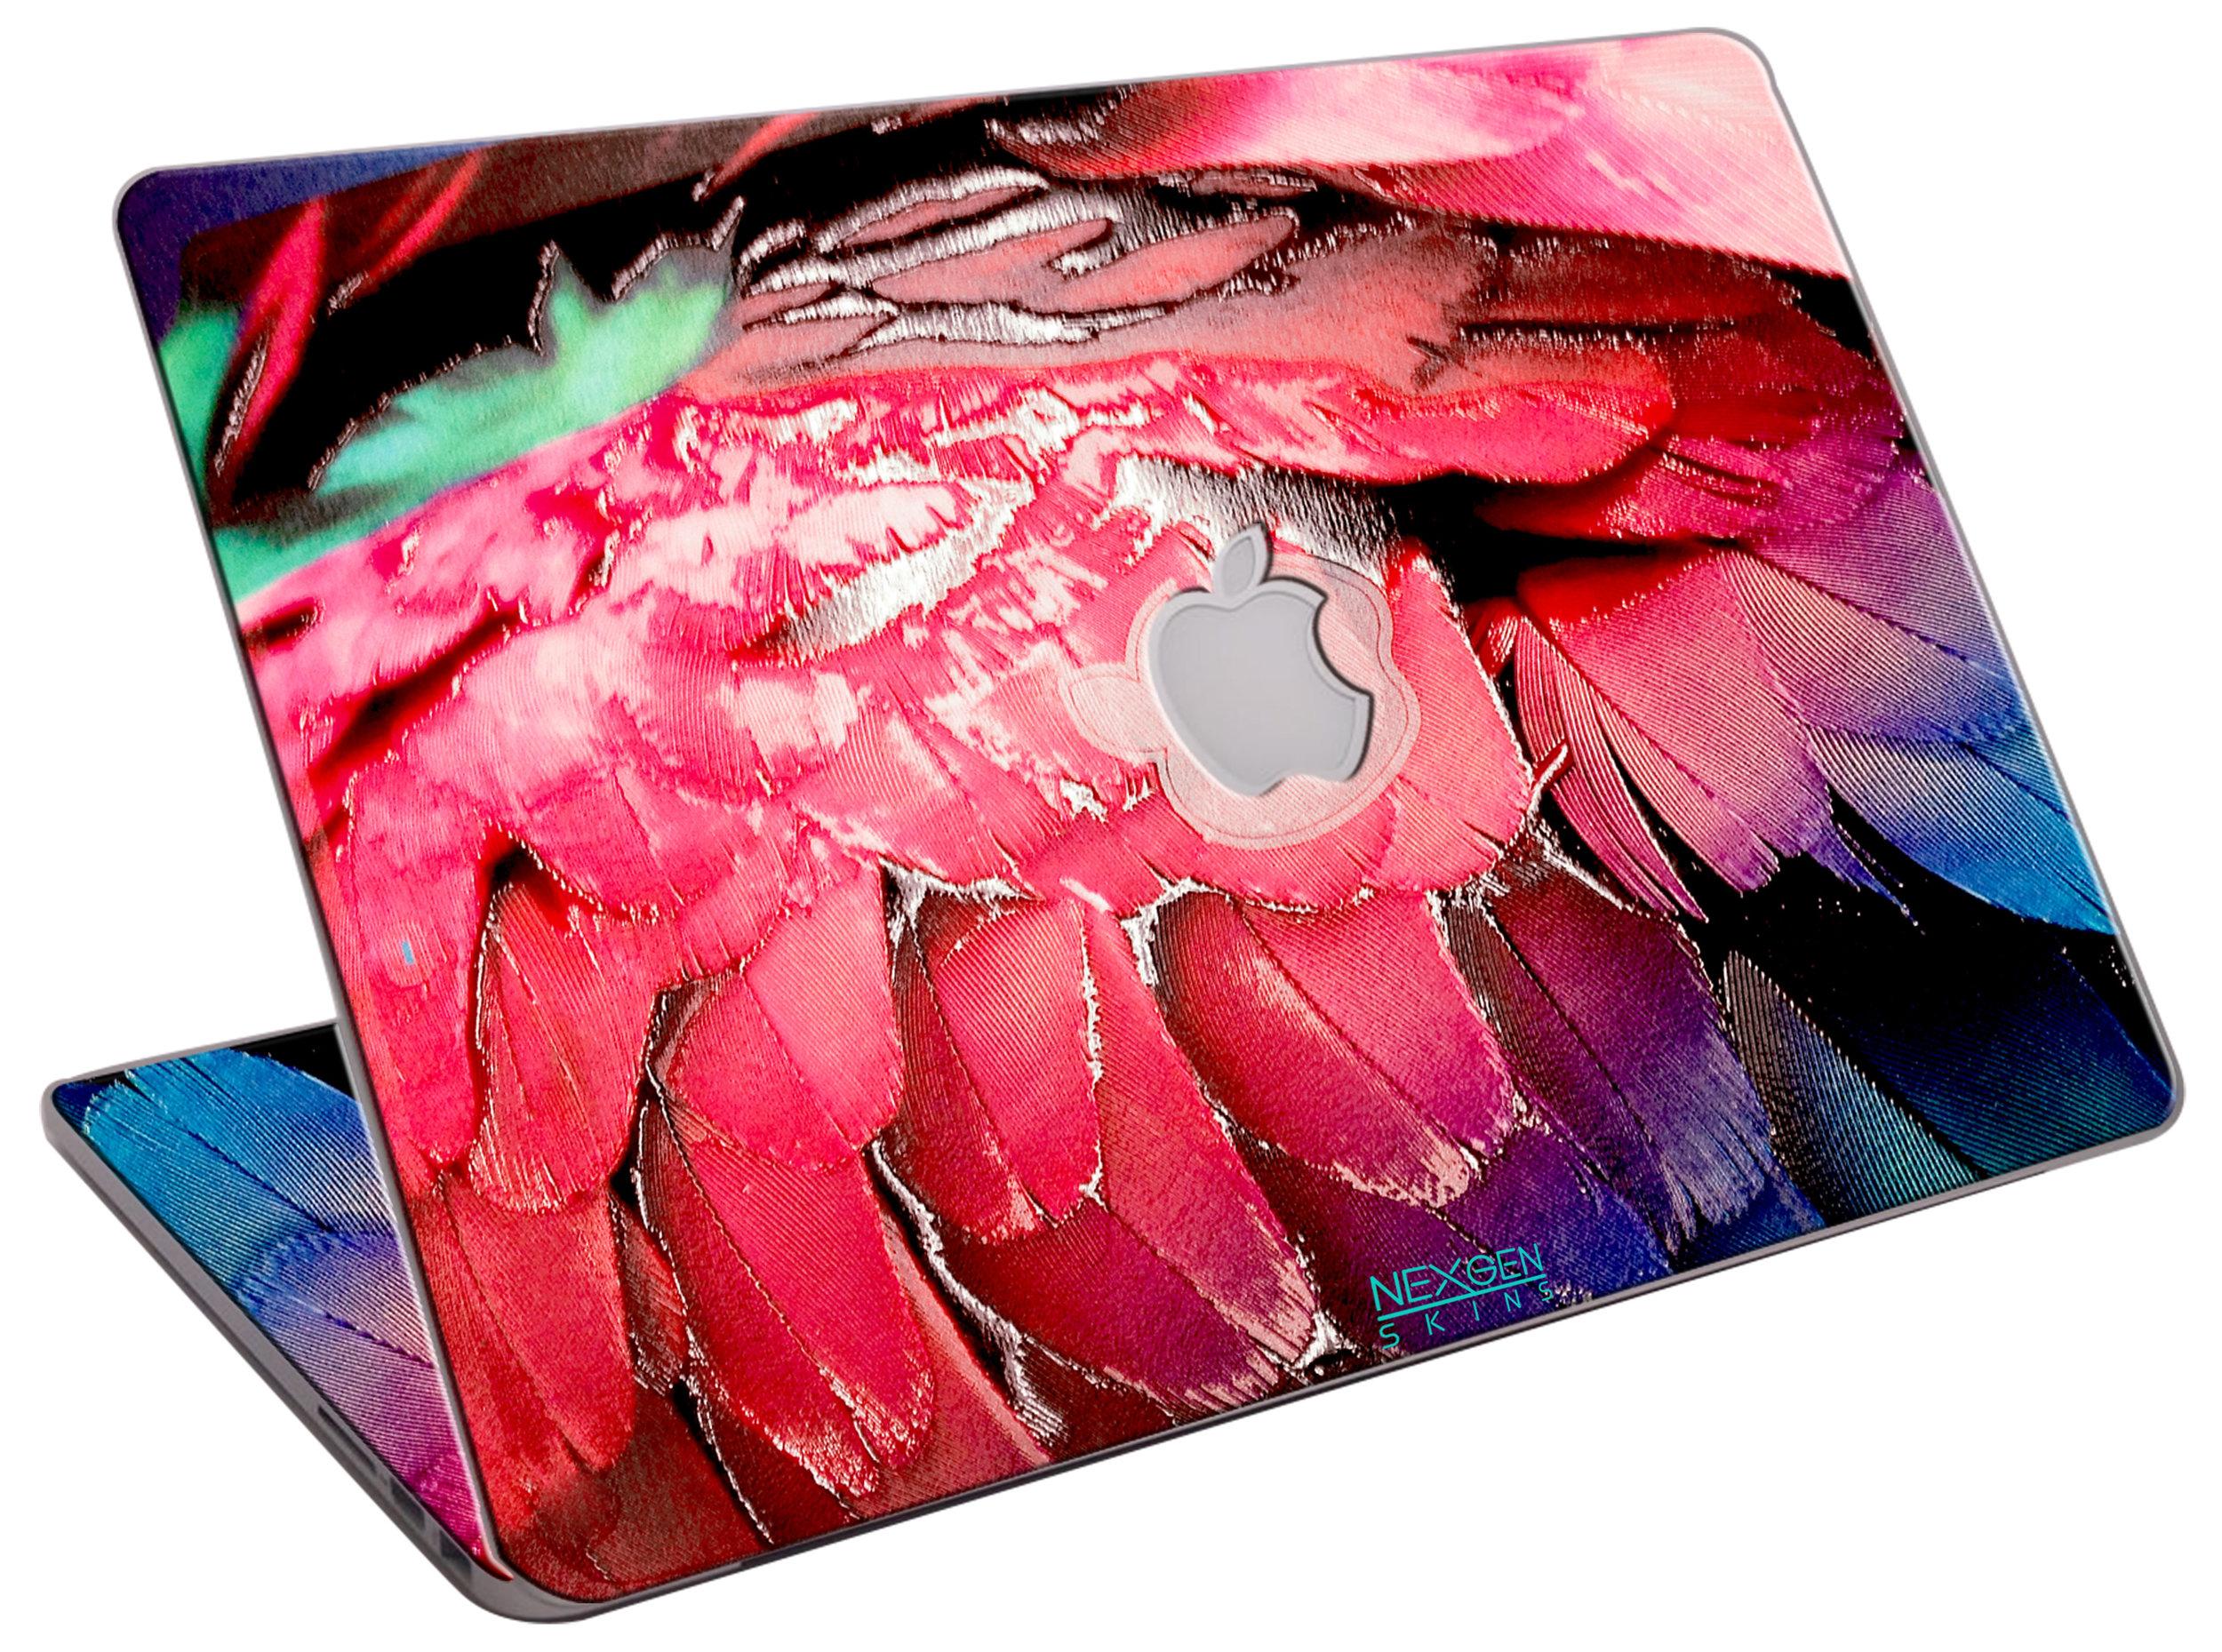 New-MacBook-Feathers.jpg